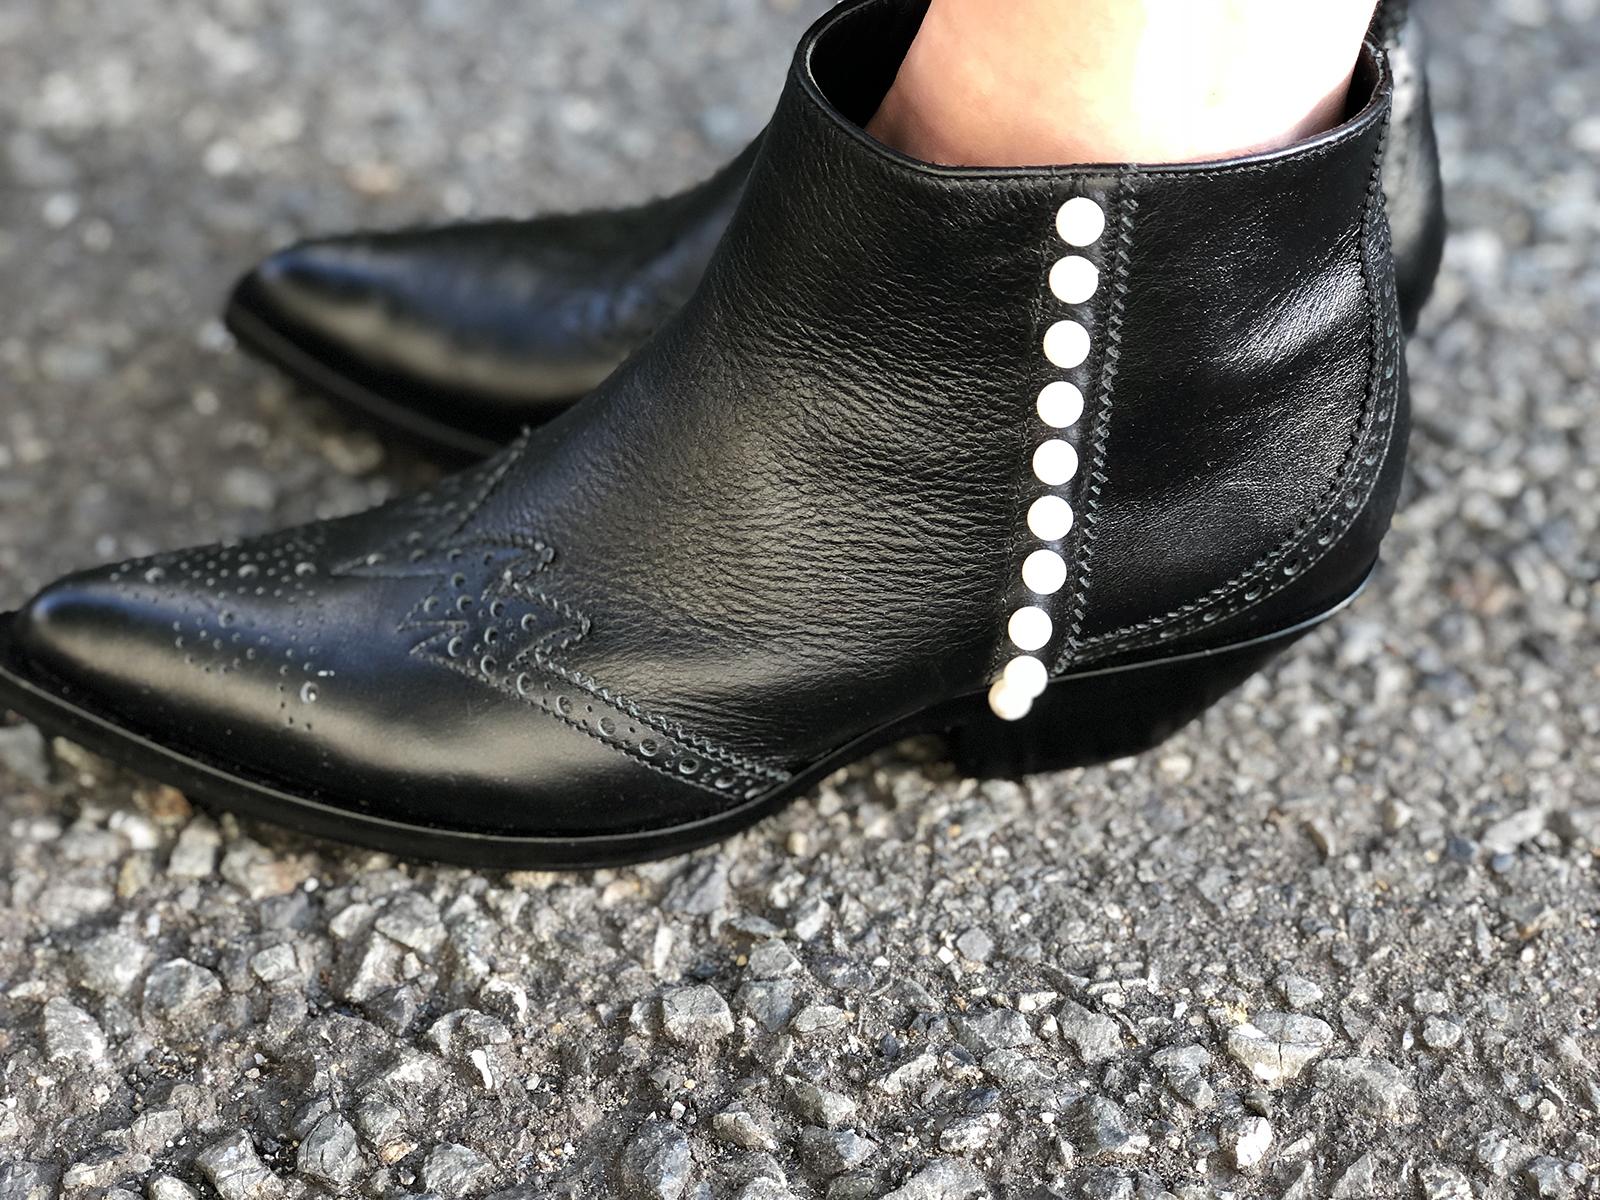 MYWL_ena_MSGM-boots_2